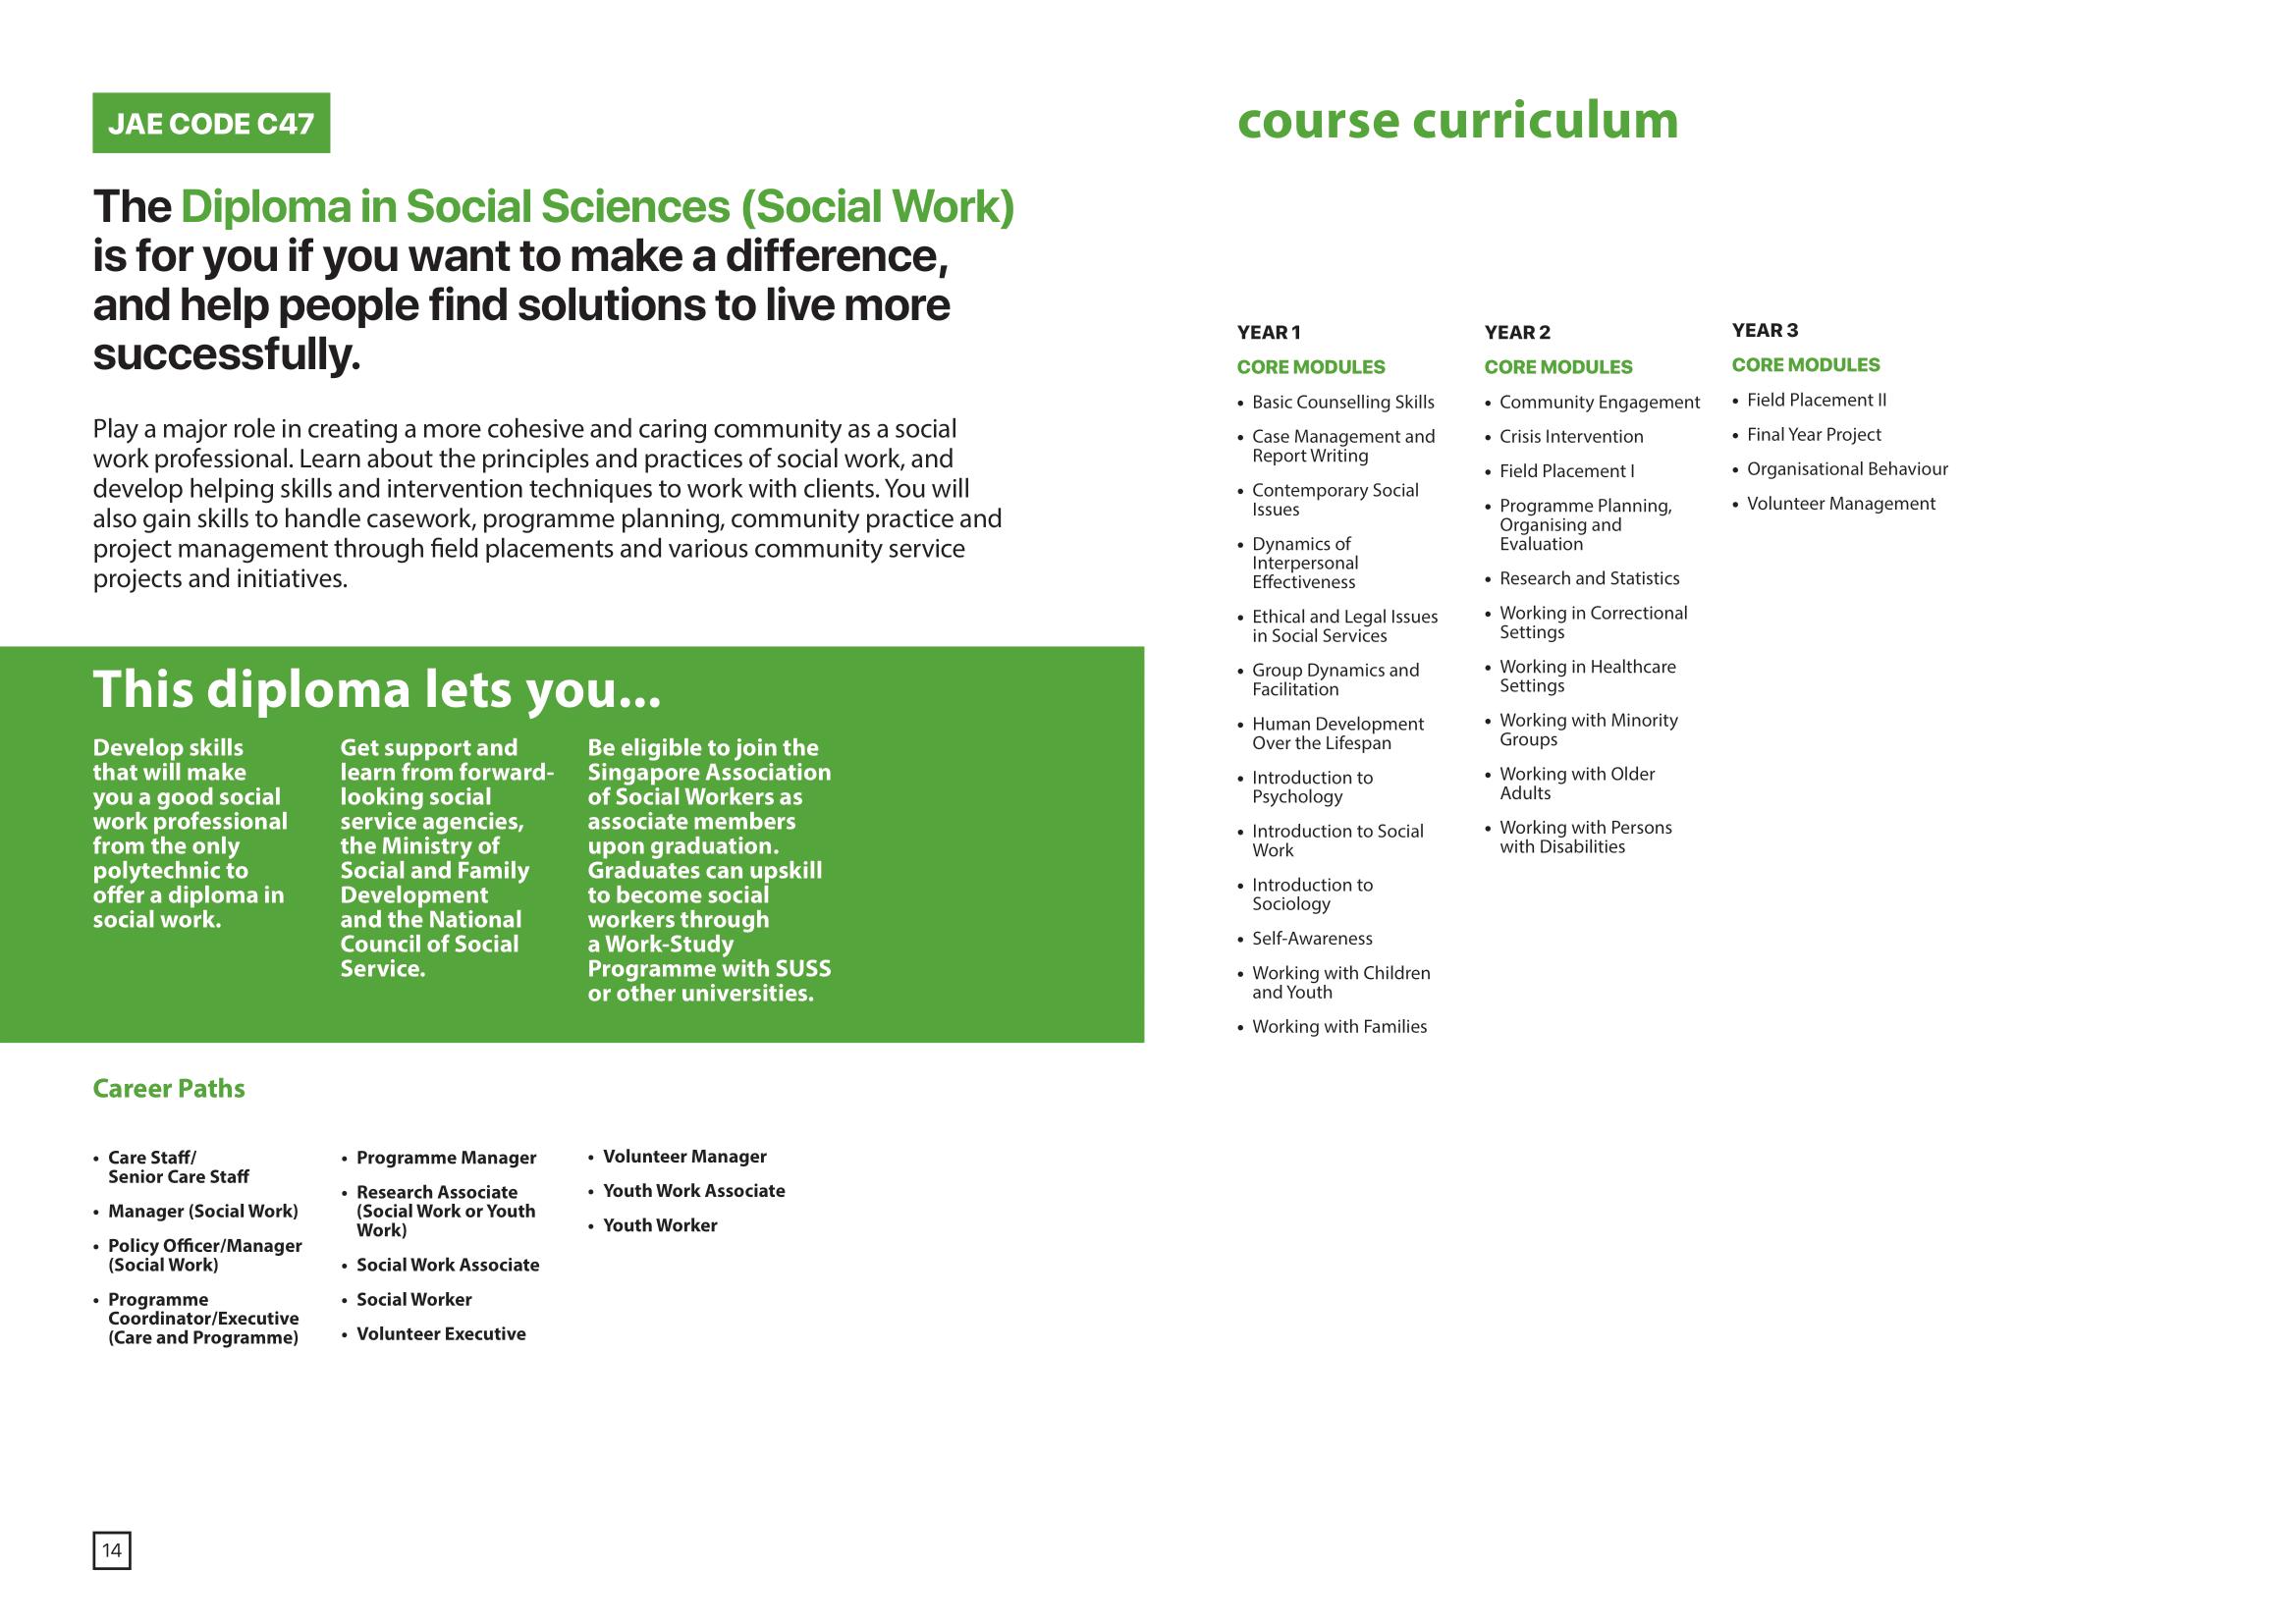 School of Health and Social Sciences 2020-09